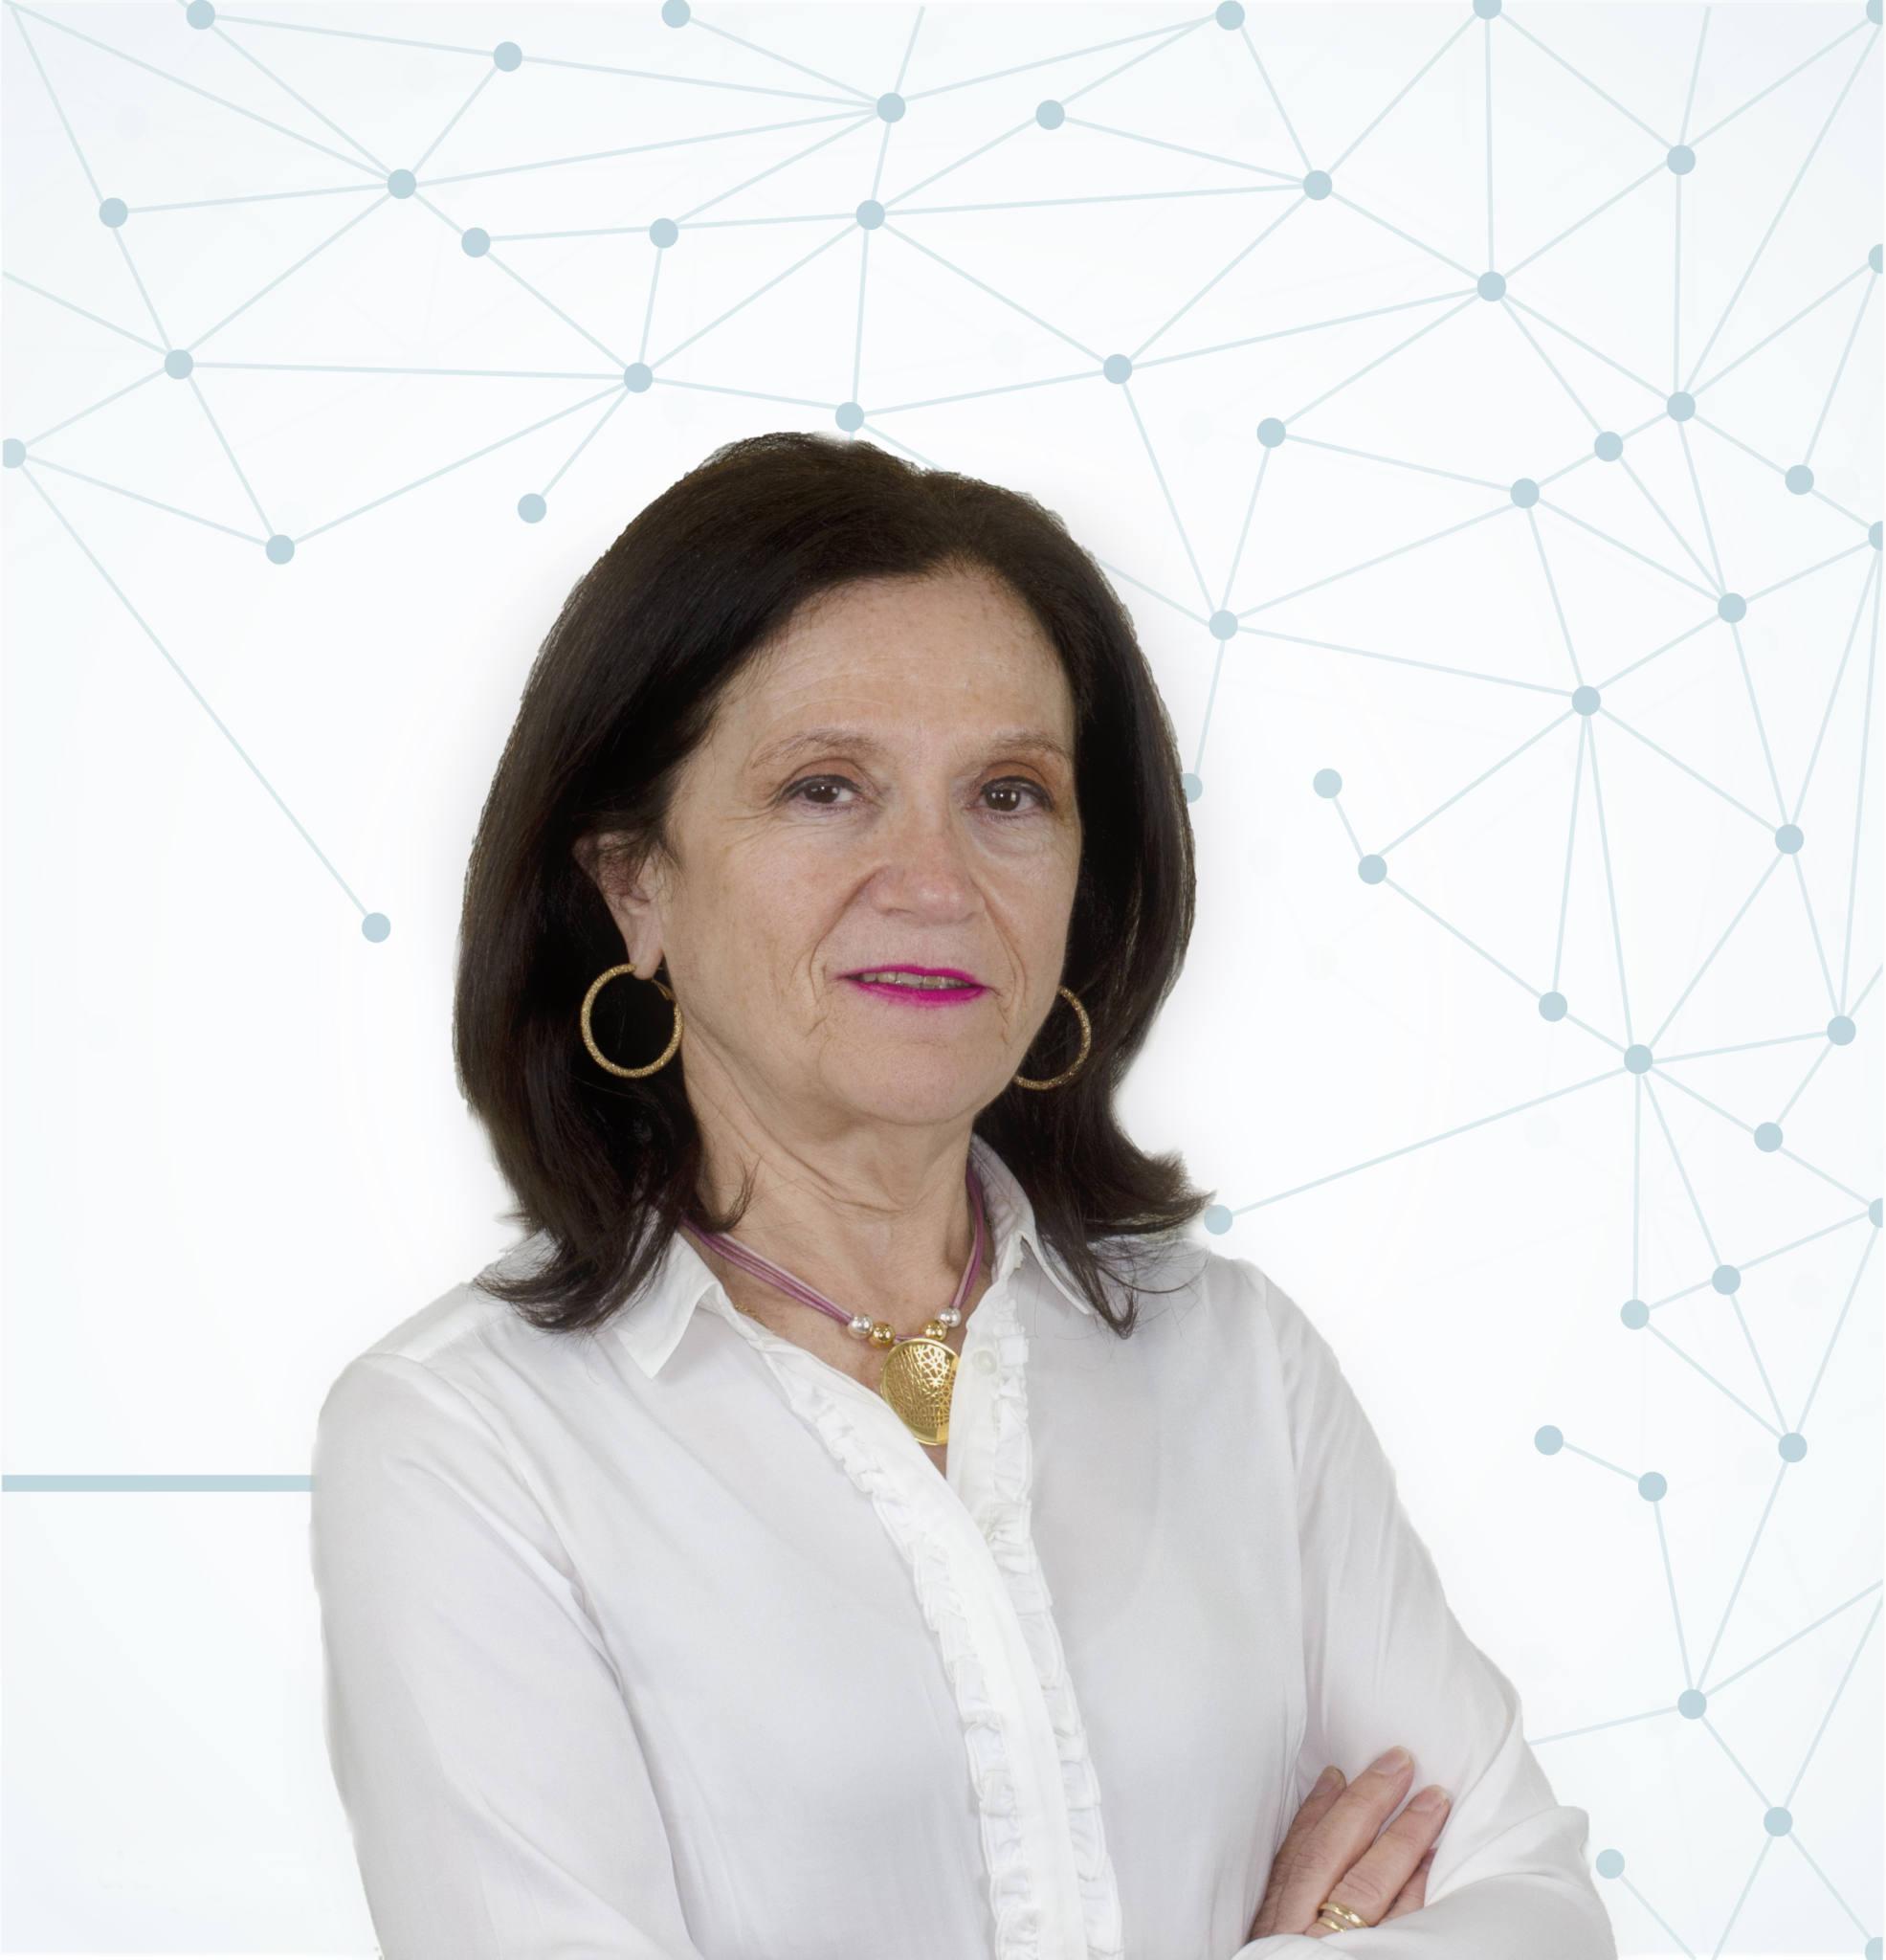 Mª Luisa Pérez García